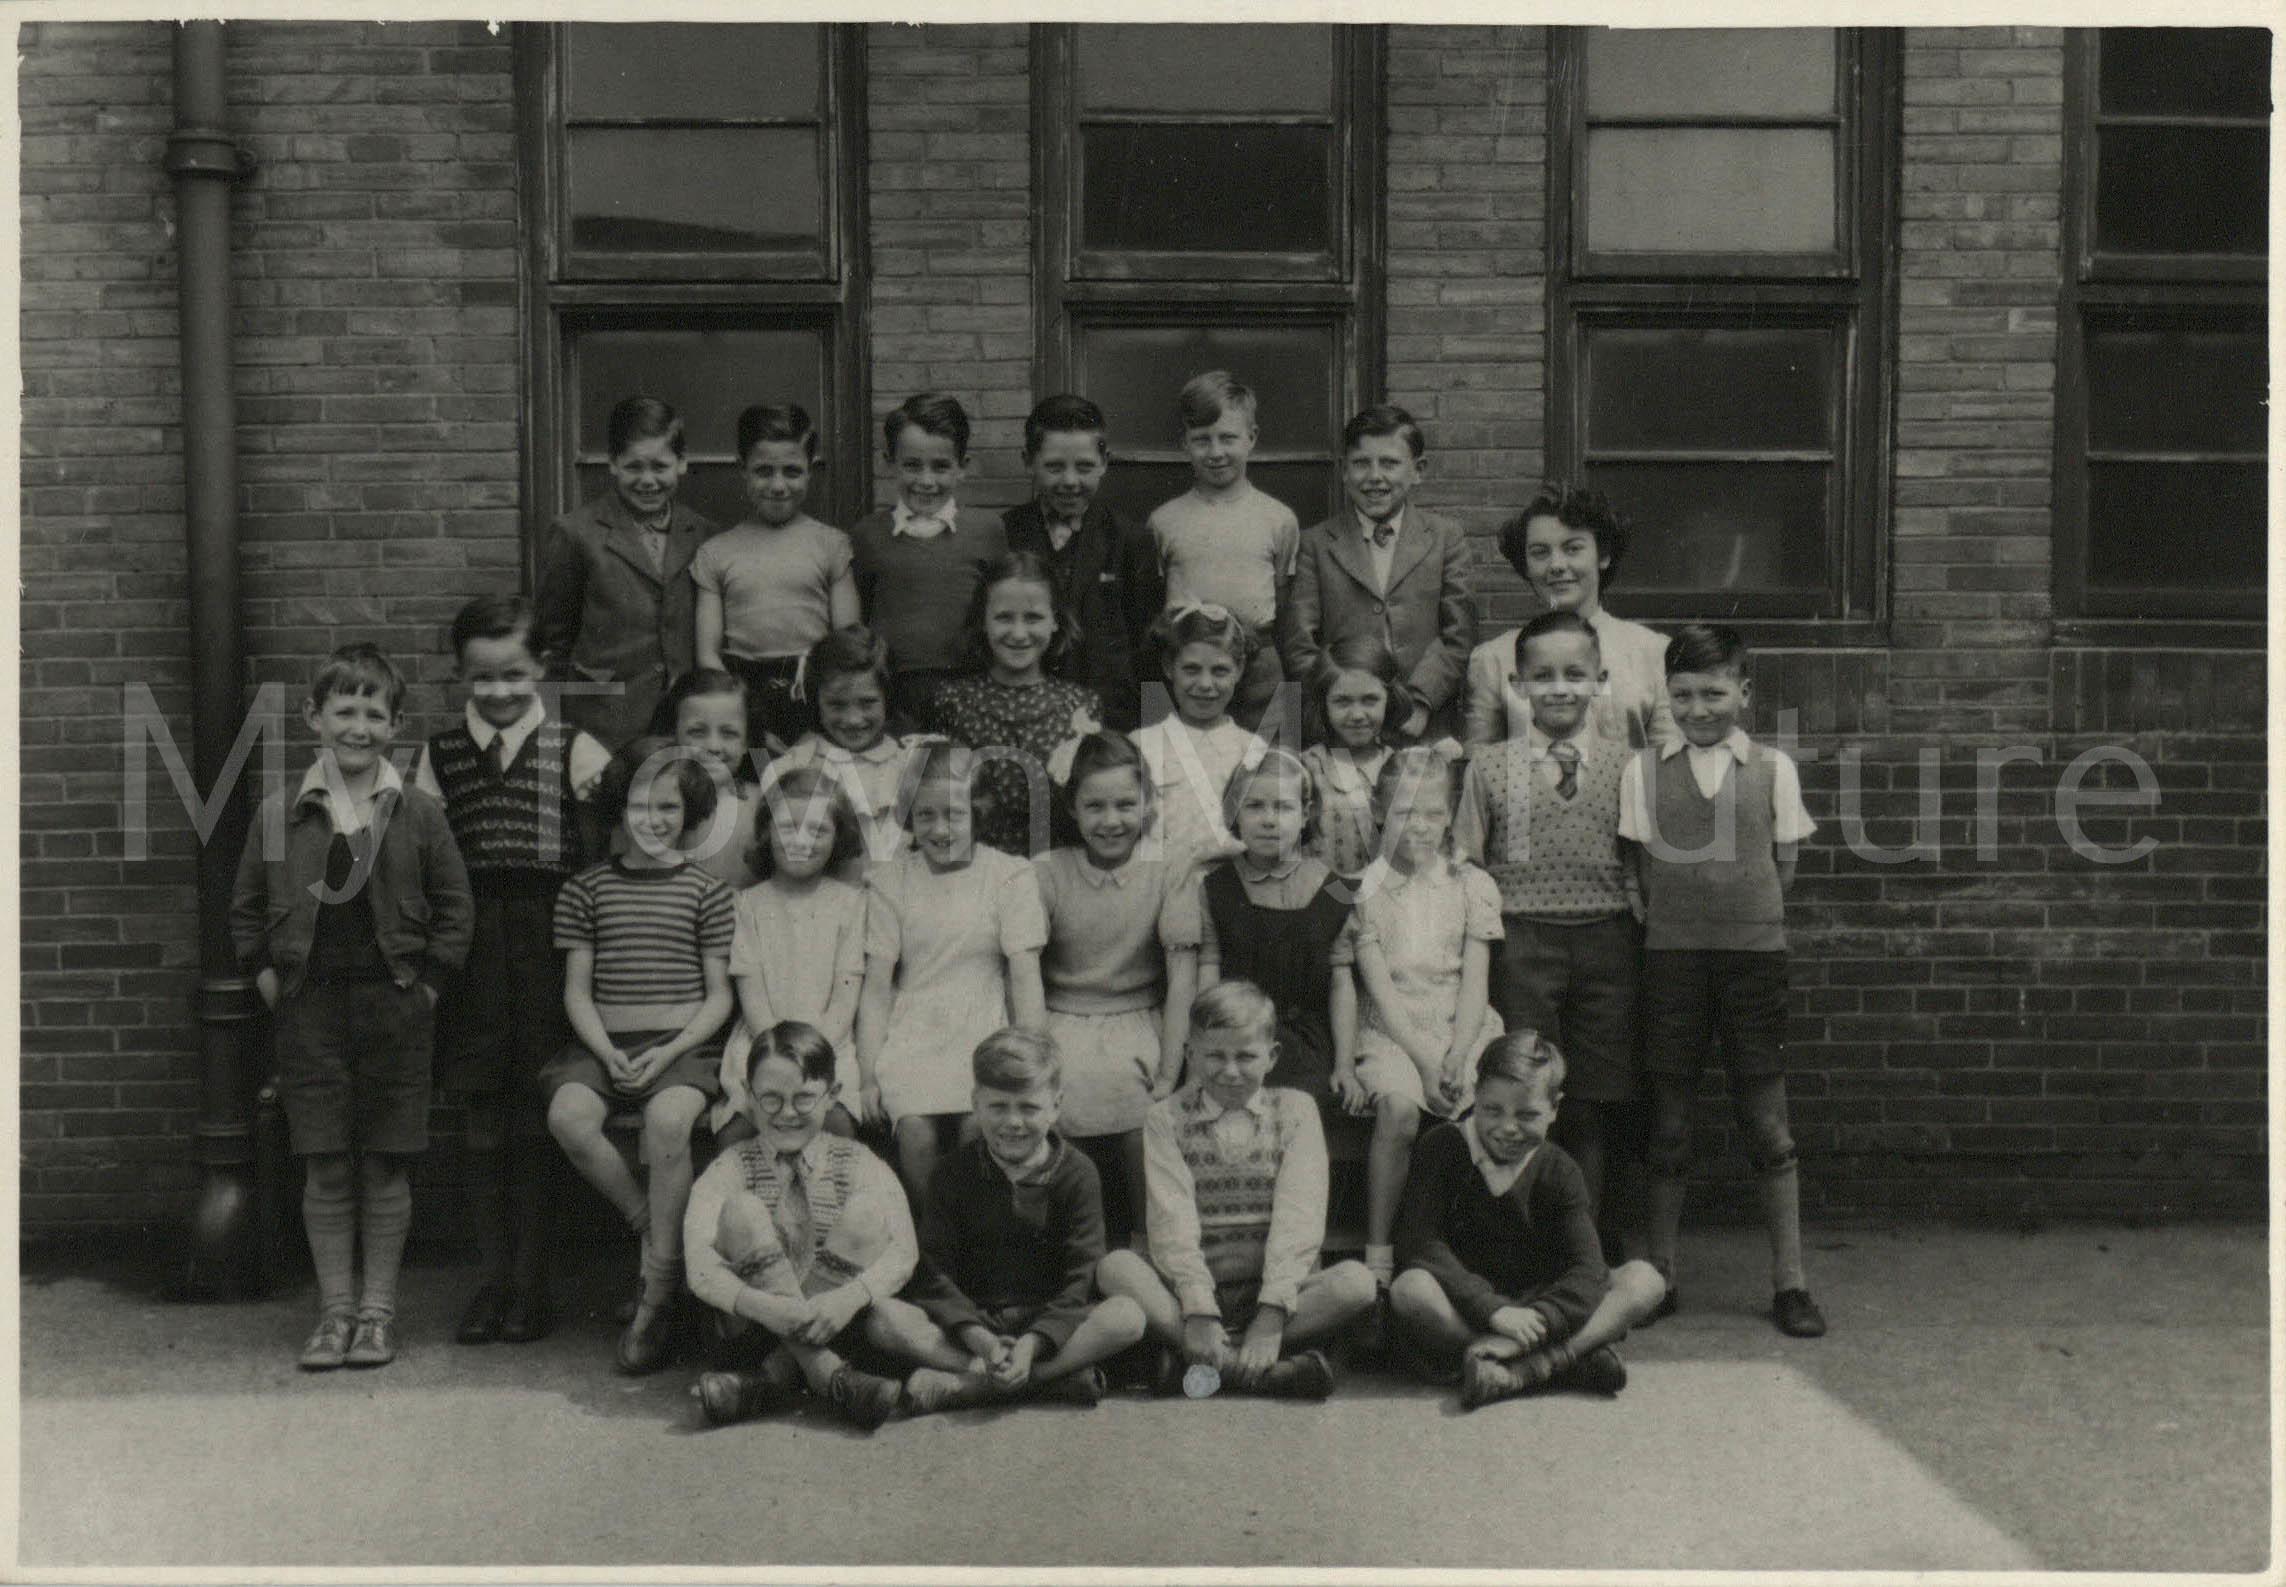 Fleetham Steet School (Miss Dent) 1950-1951